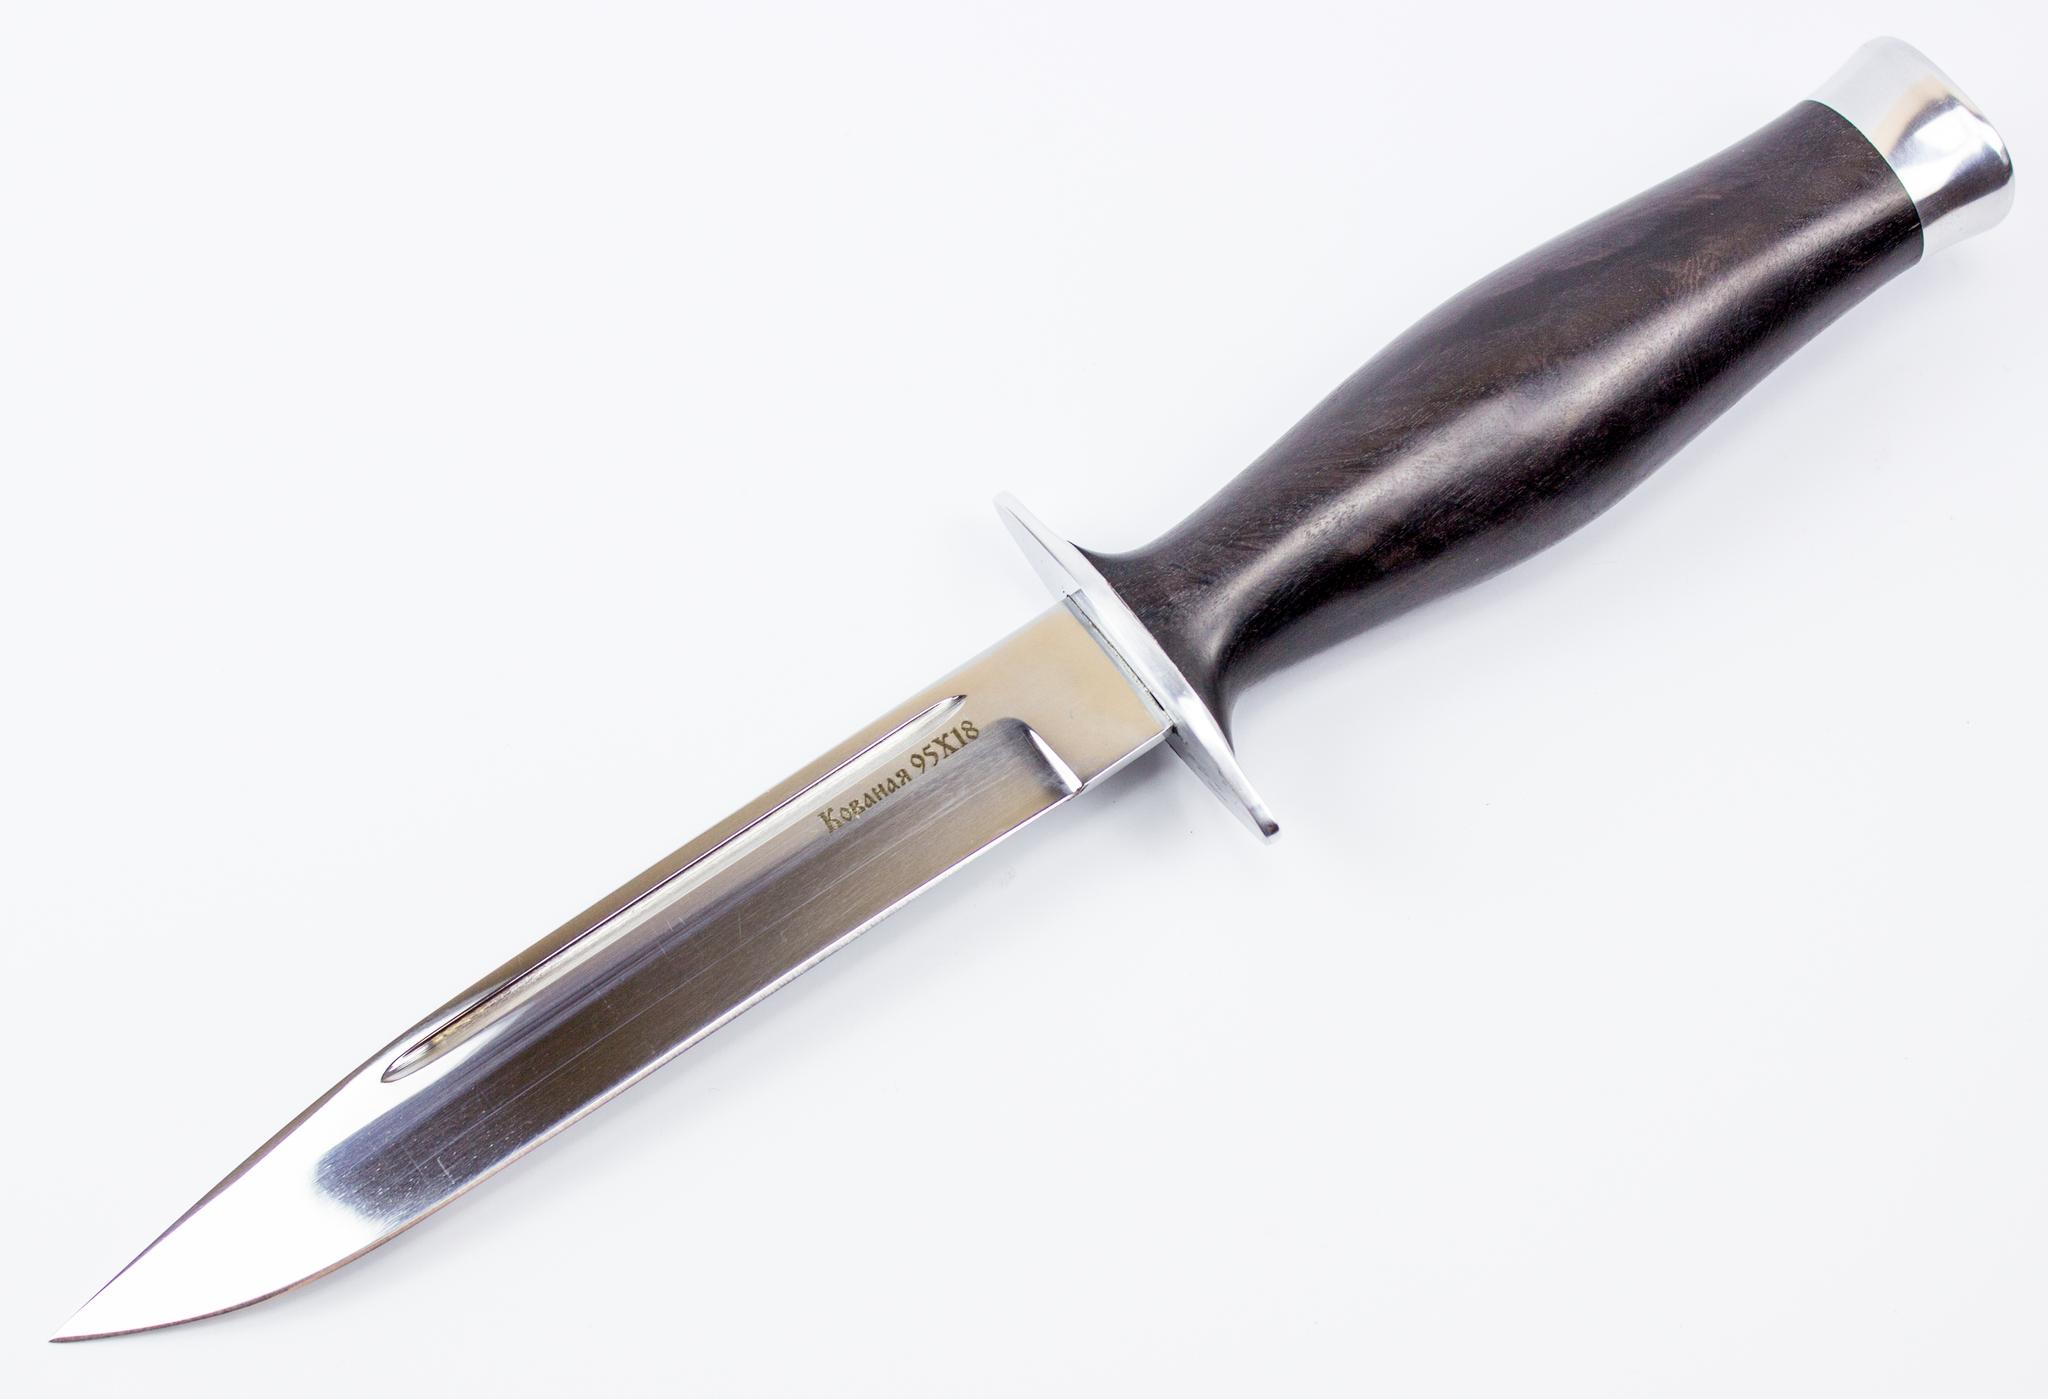 Нож НР-43 ВишняНожи Ворсма<br><br>